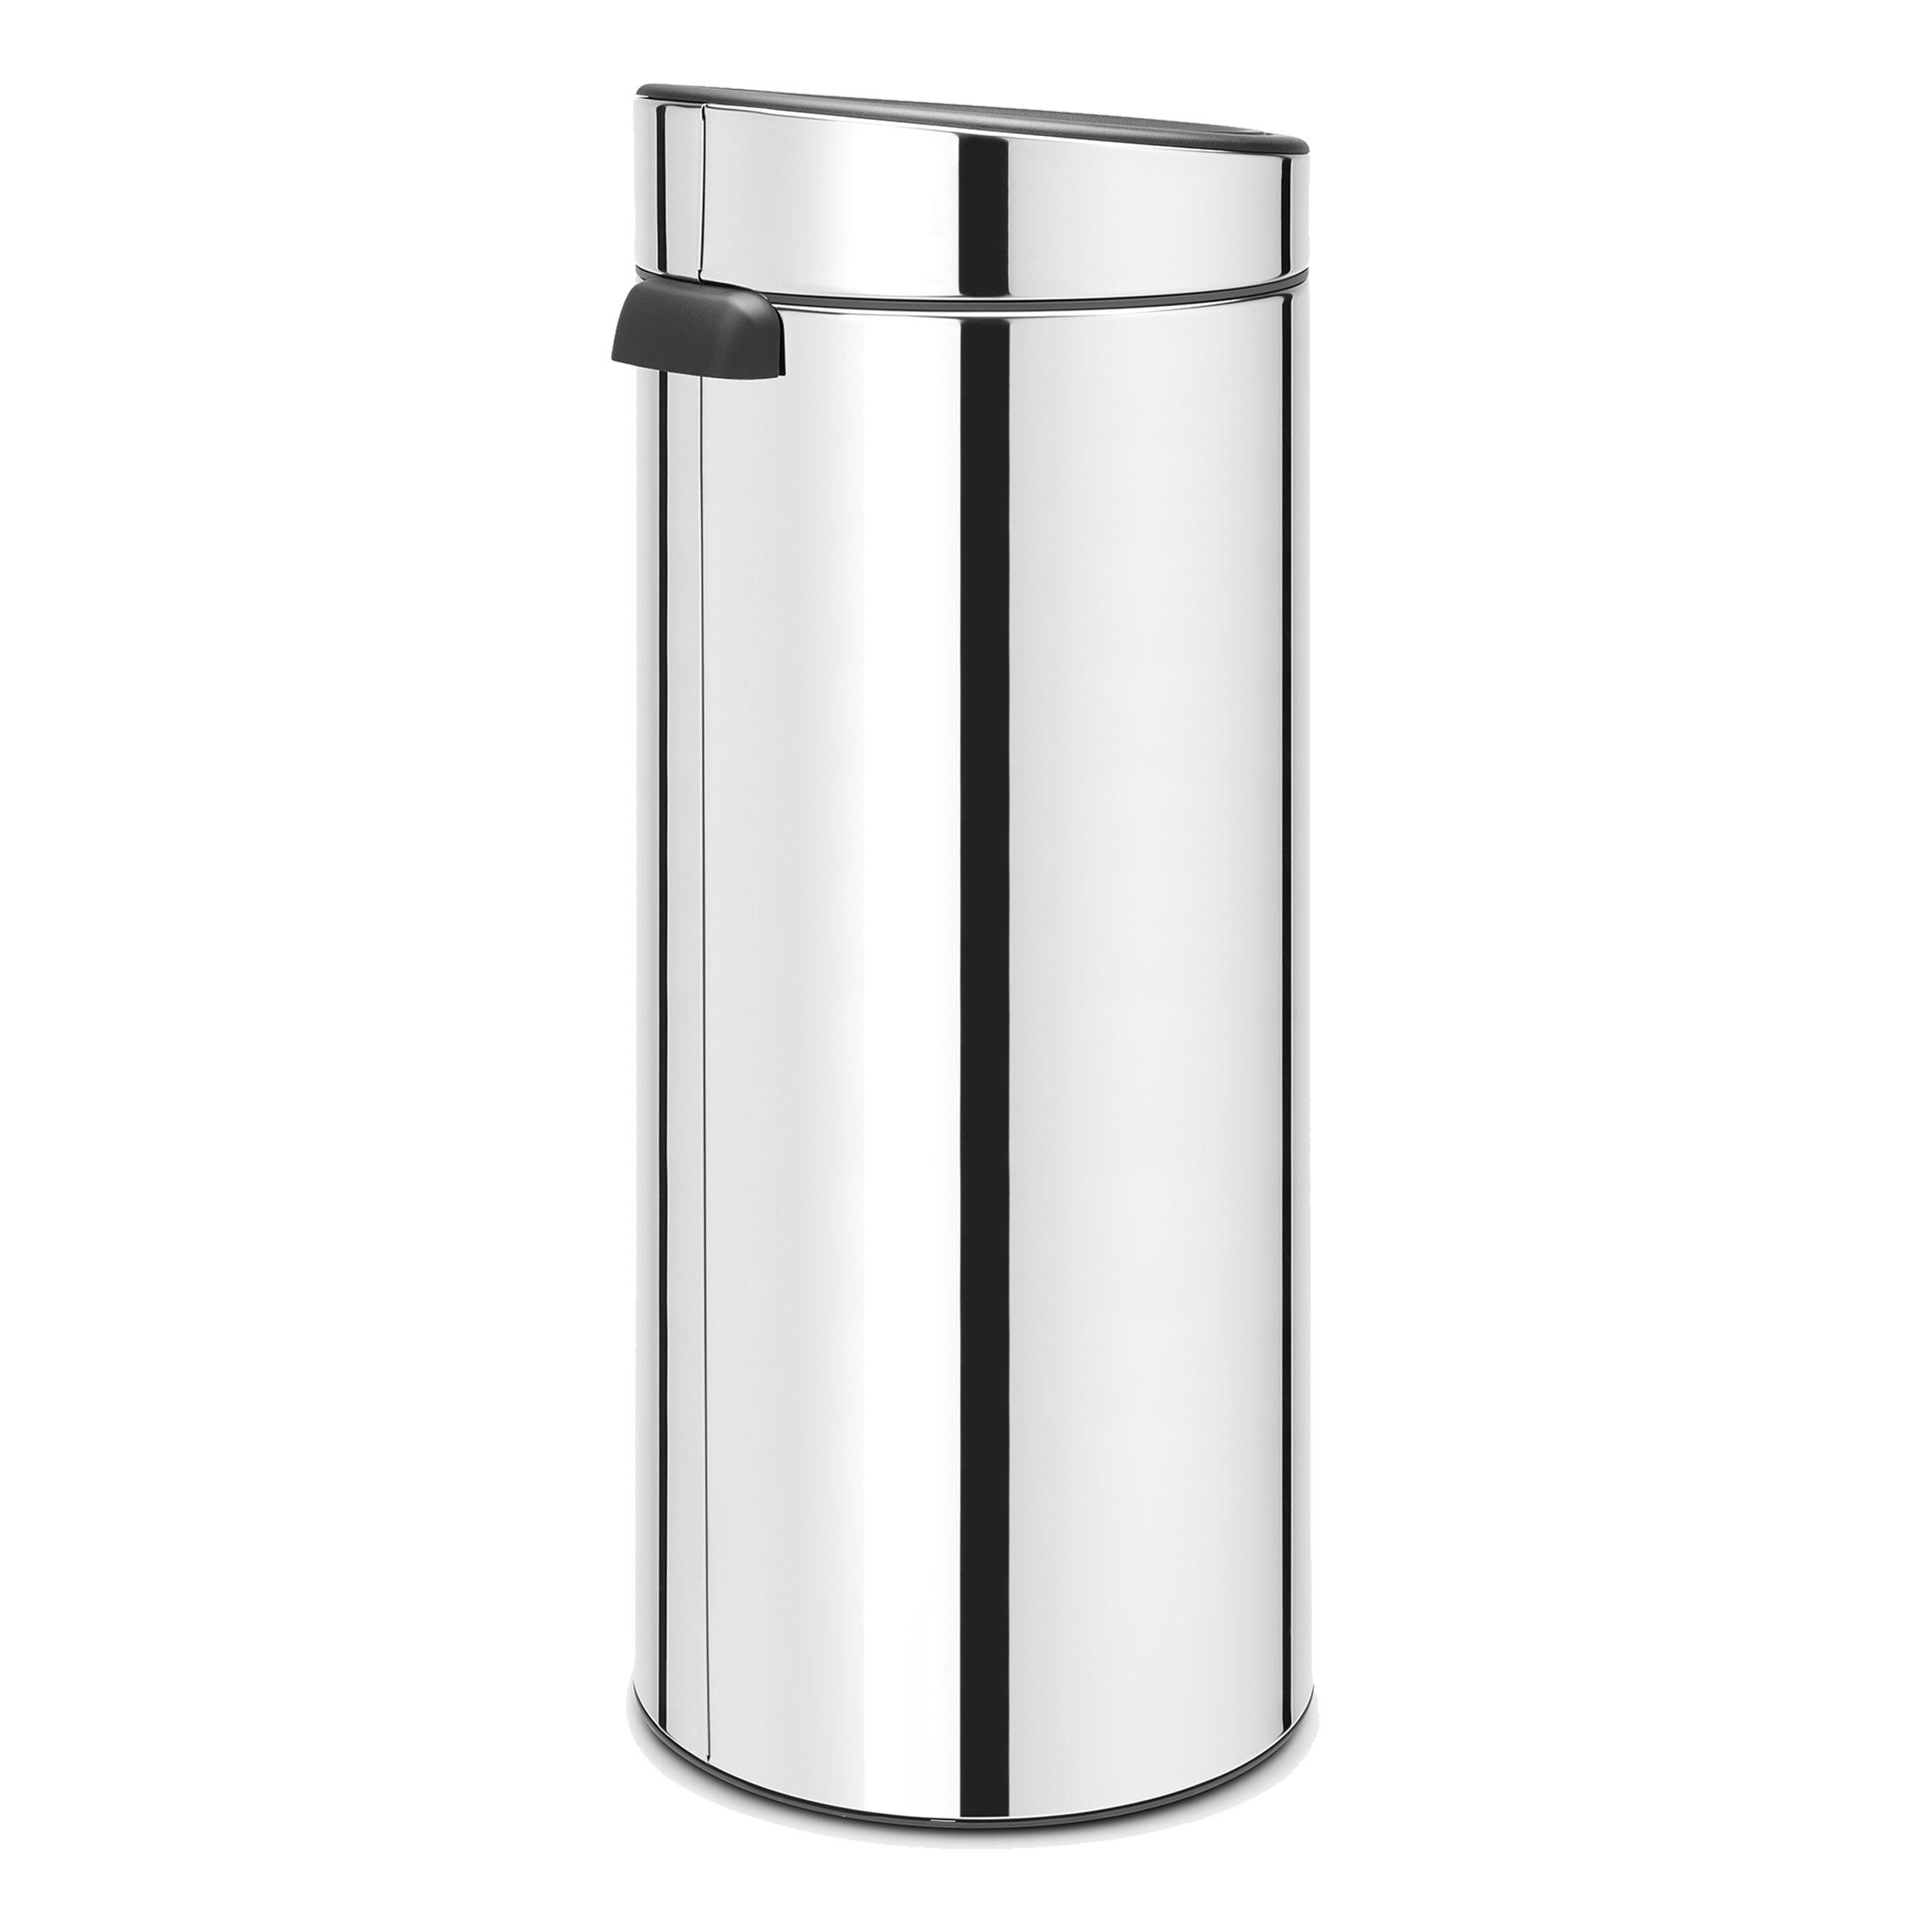 Brabantia Touch Bin 30 Liter.Brabantia Touch Bin Trash Can Wastebasket Dustbin In Brilliant